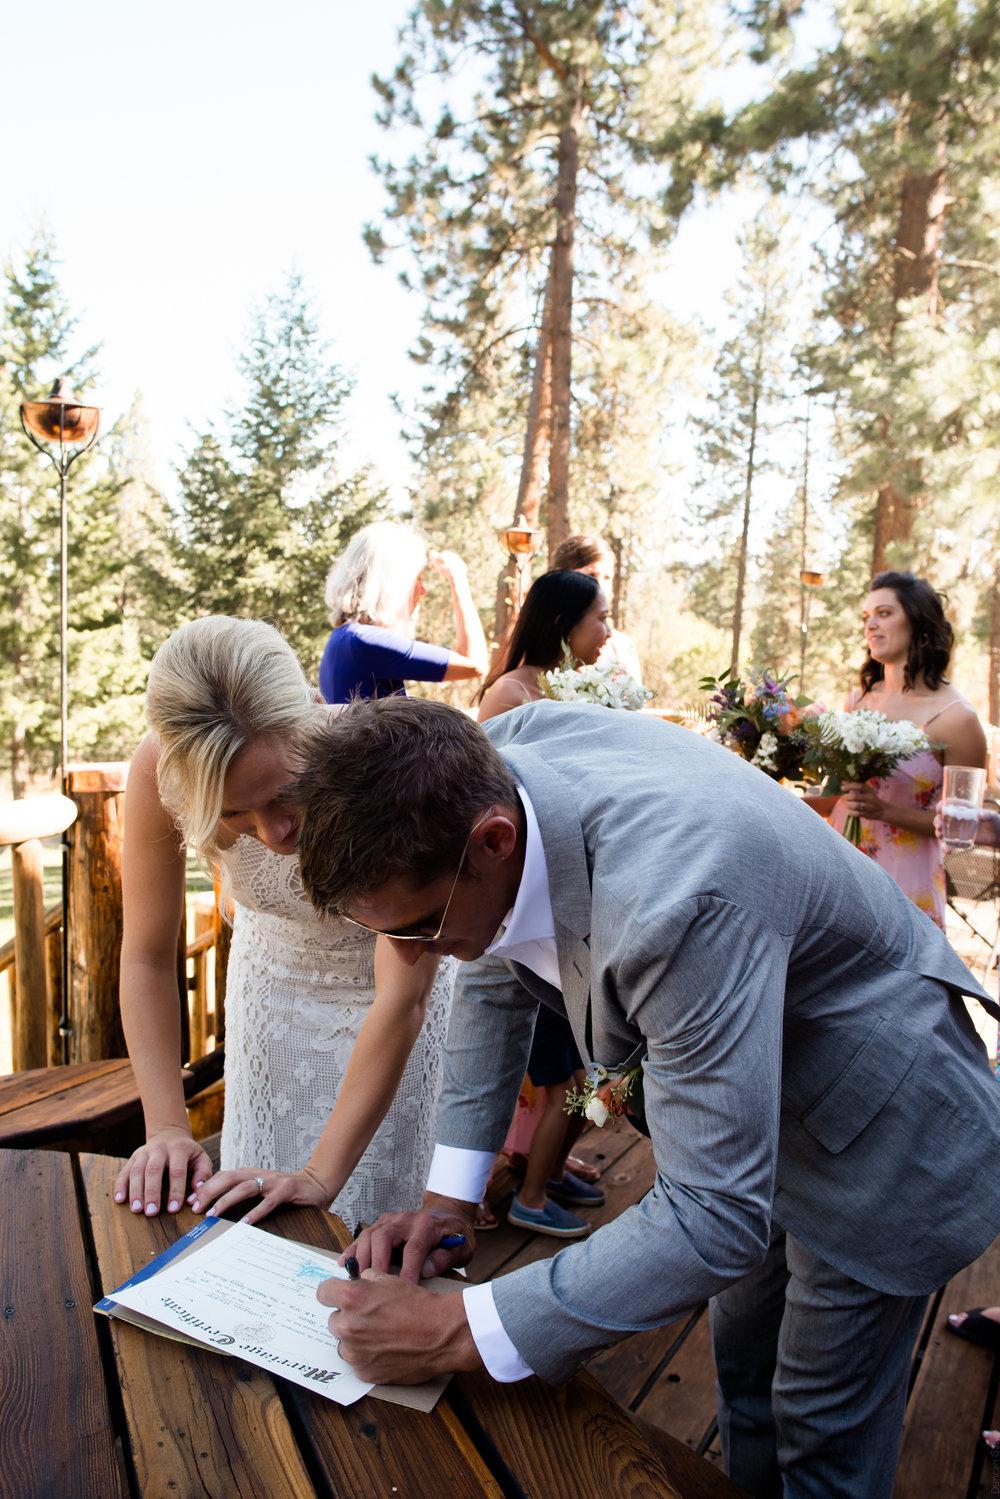 Lana Micah Wedding La Grande Oregon September 2018 Please Credit Talia Jean Galvin (144 of 687).jpg